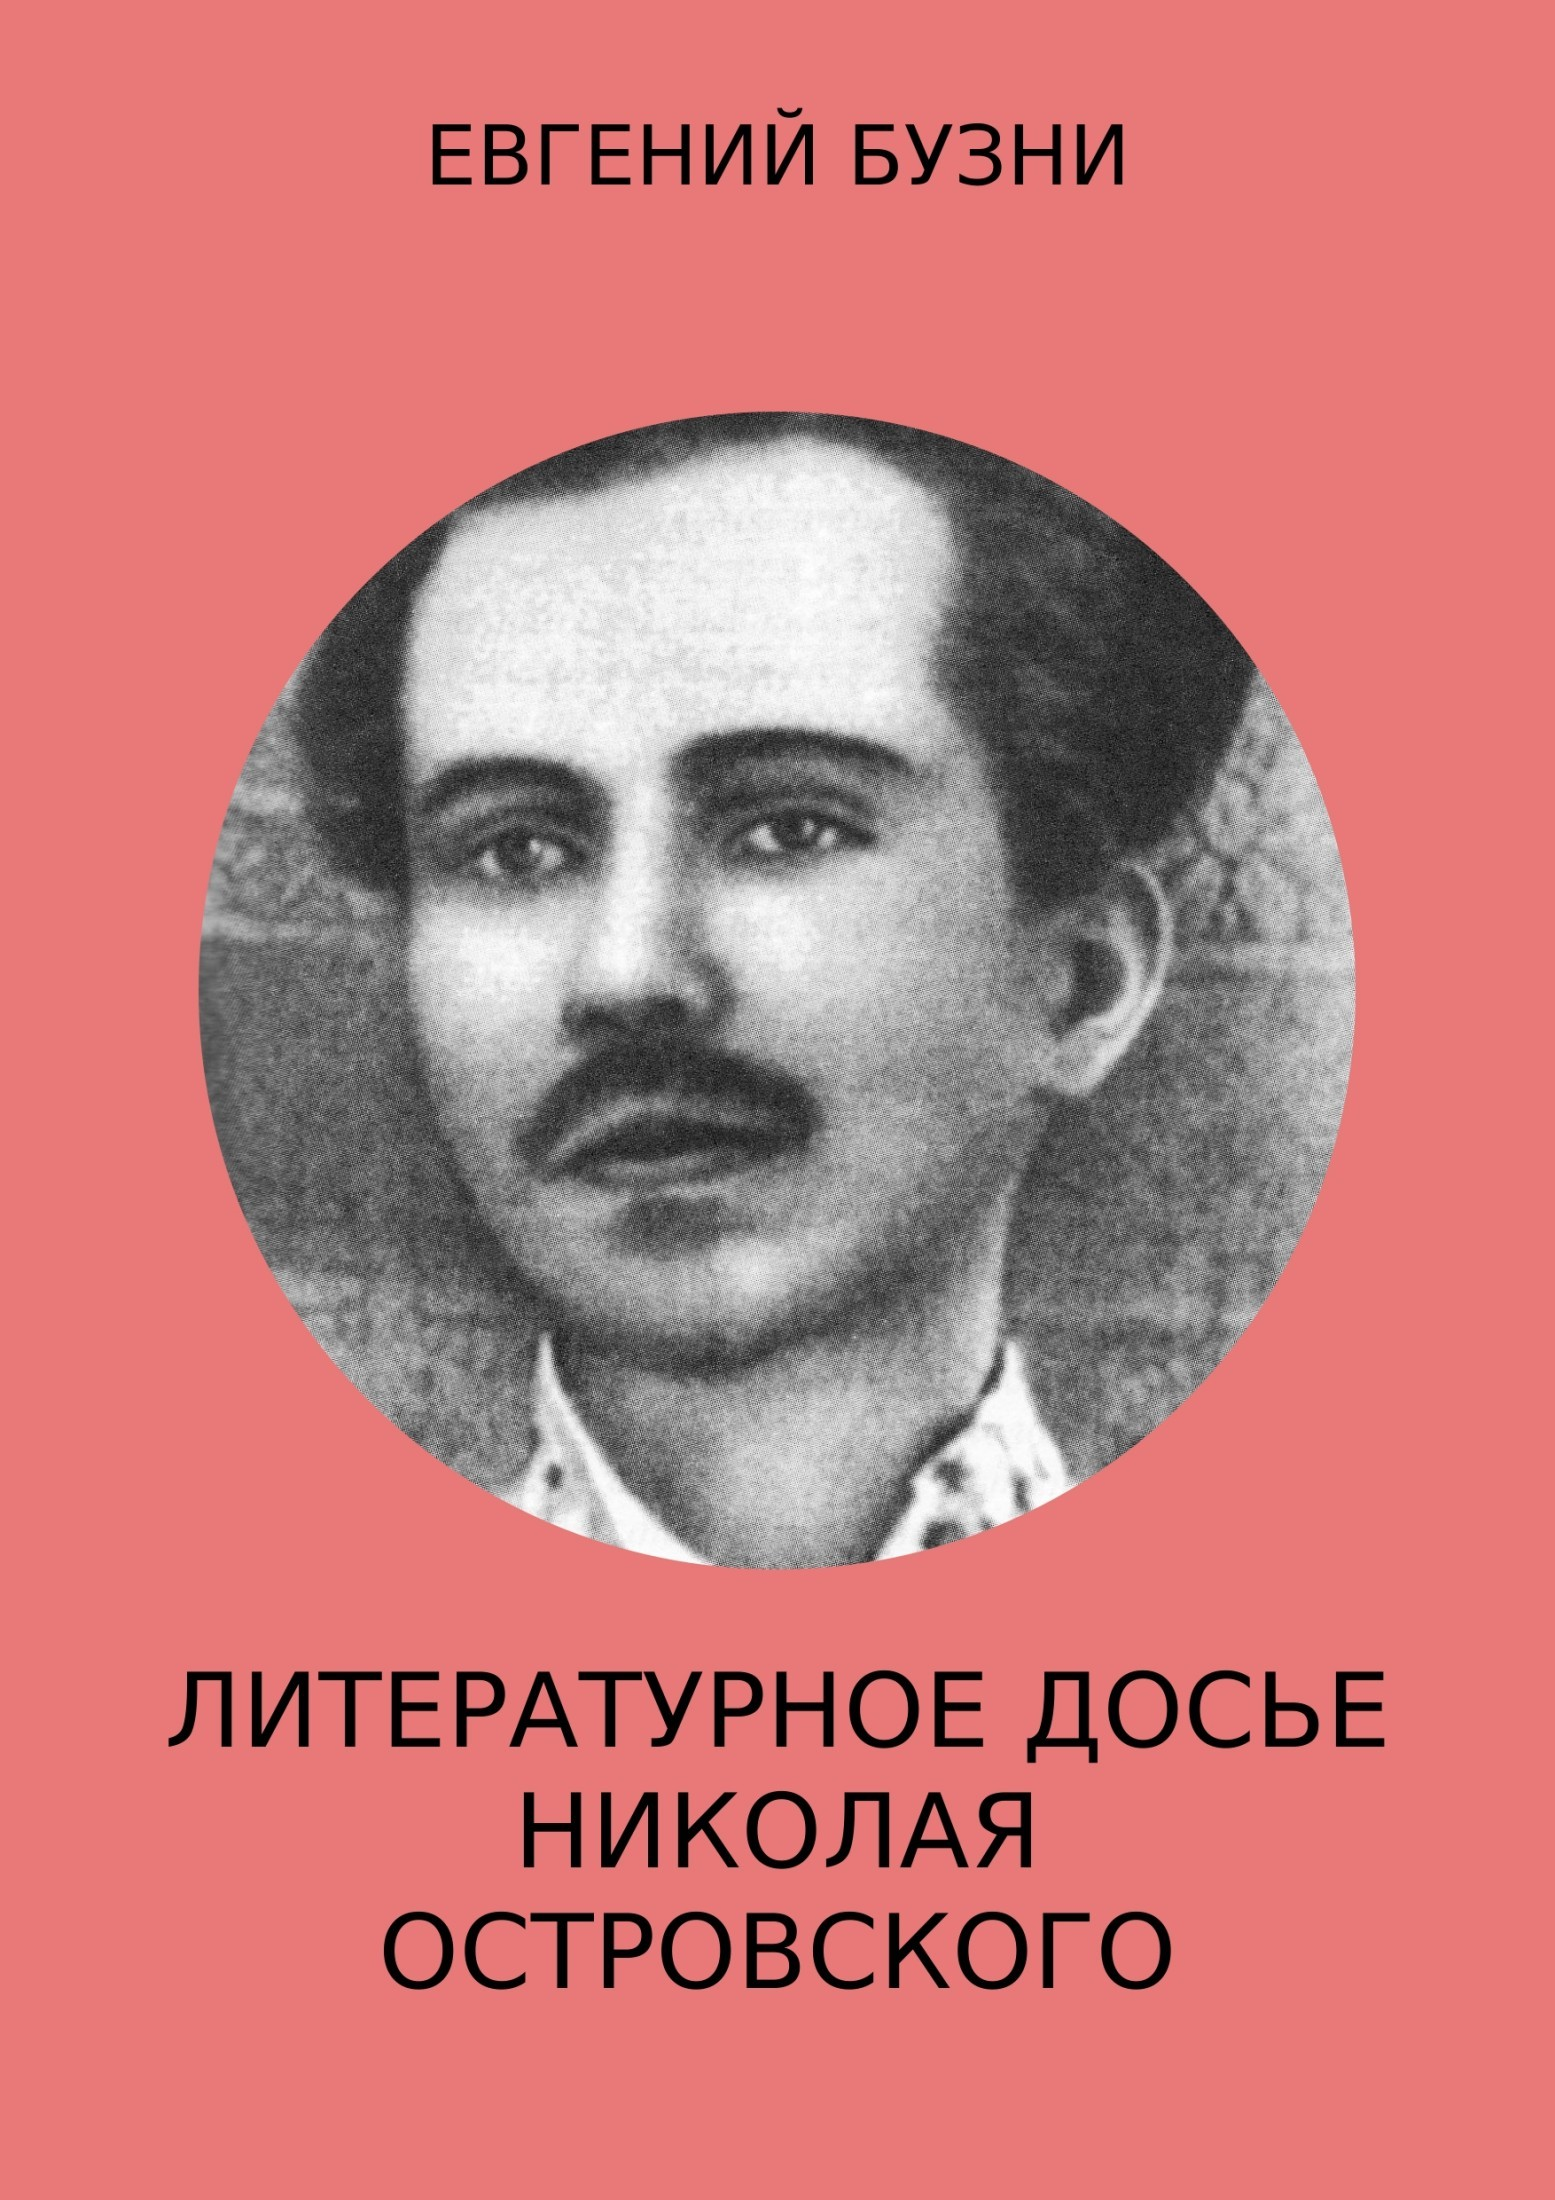 Евгений Николаевич Бузни бесплатно